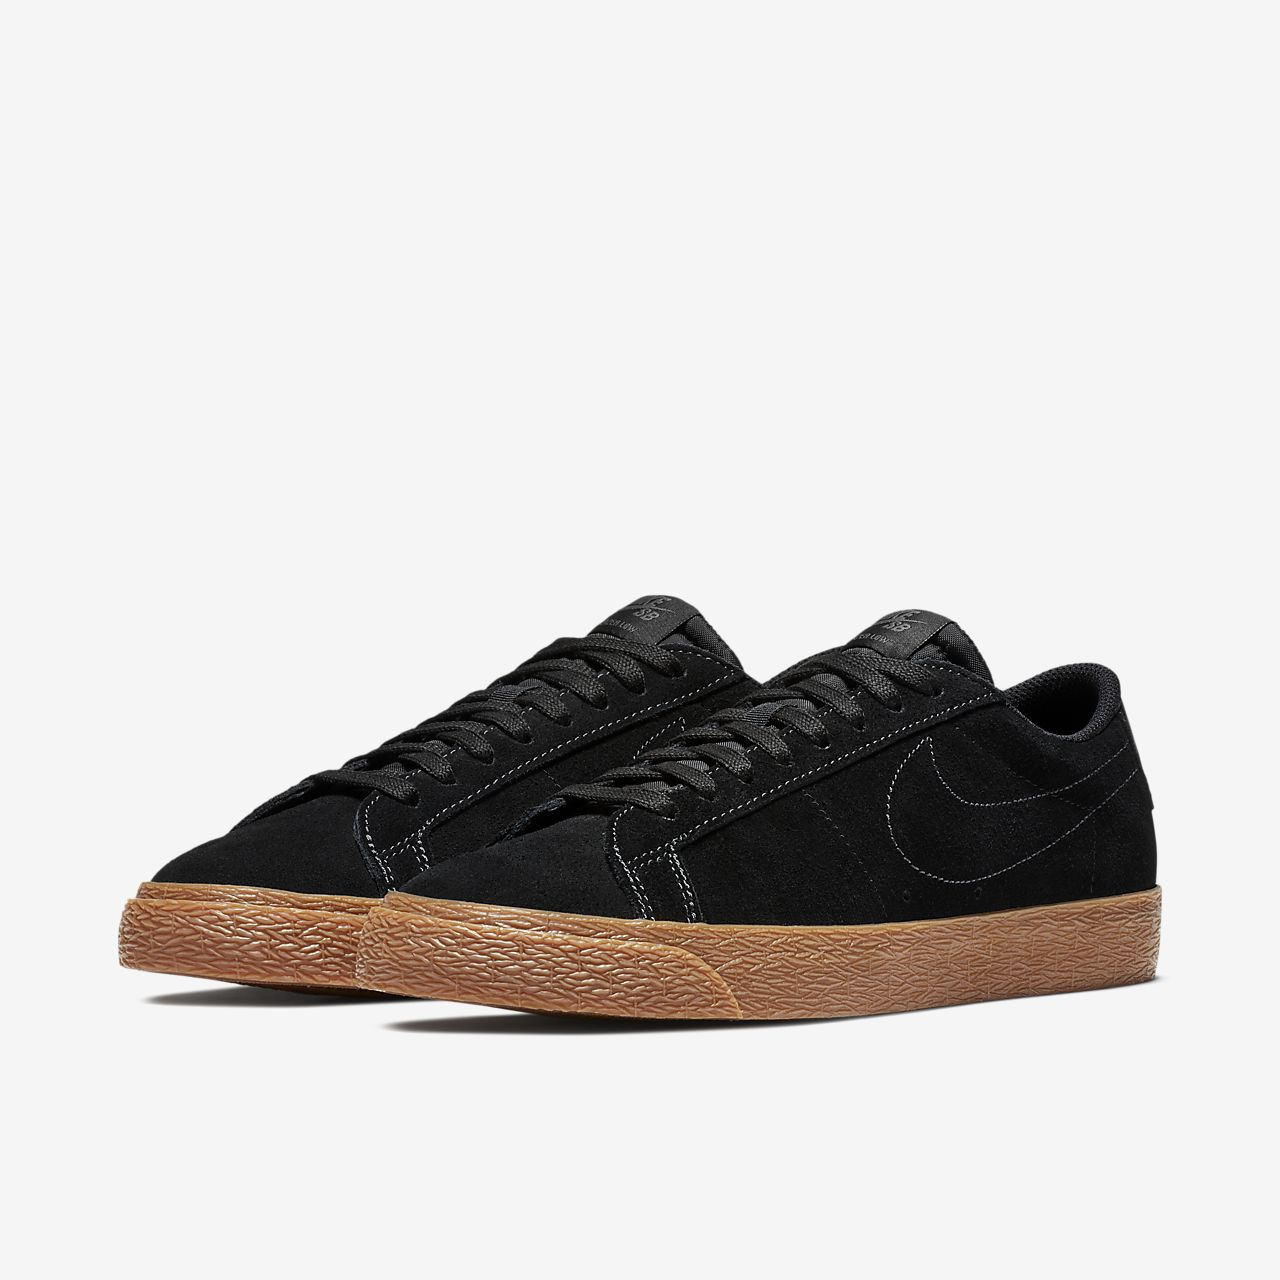 ... Chaussure de skateboard Nike SB Blazer Low pour Homme